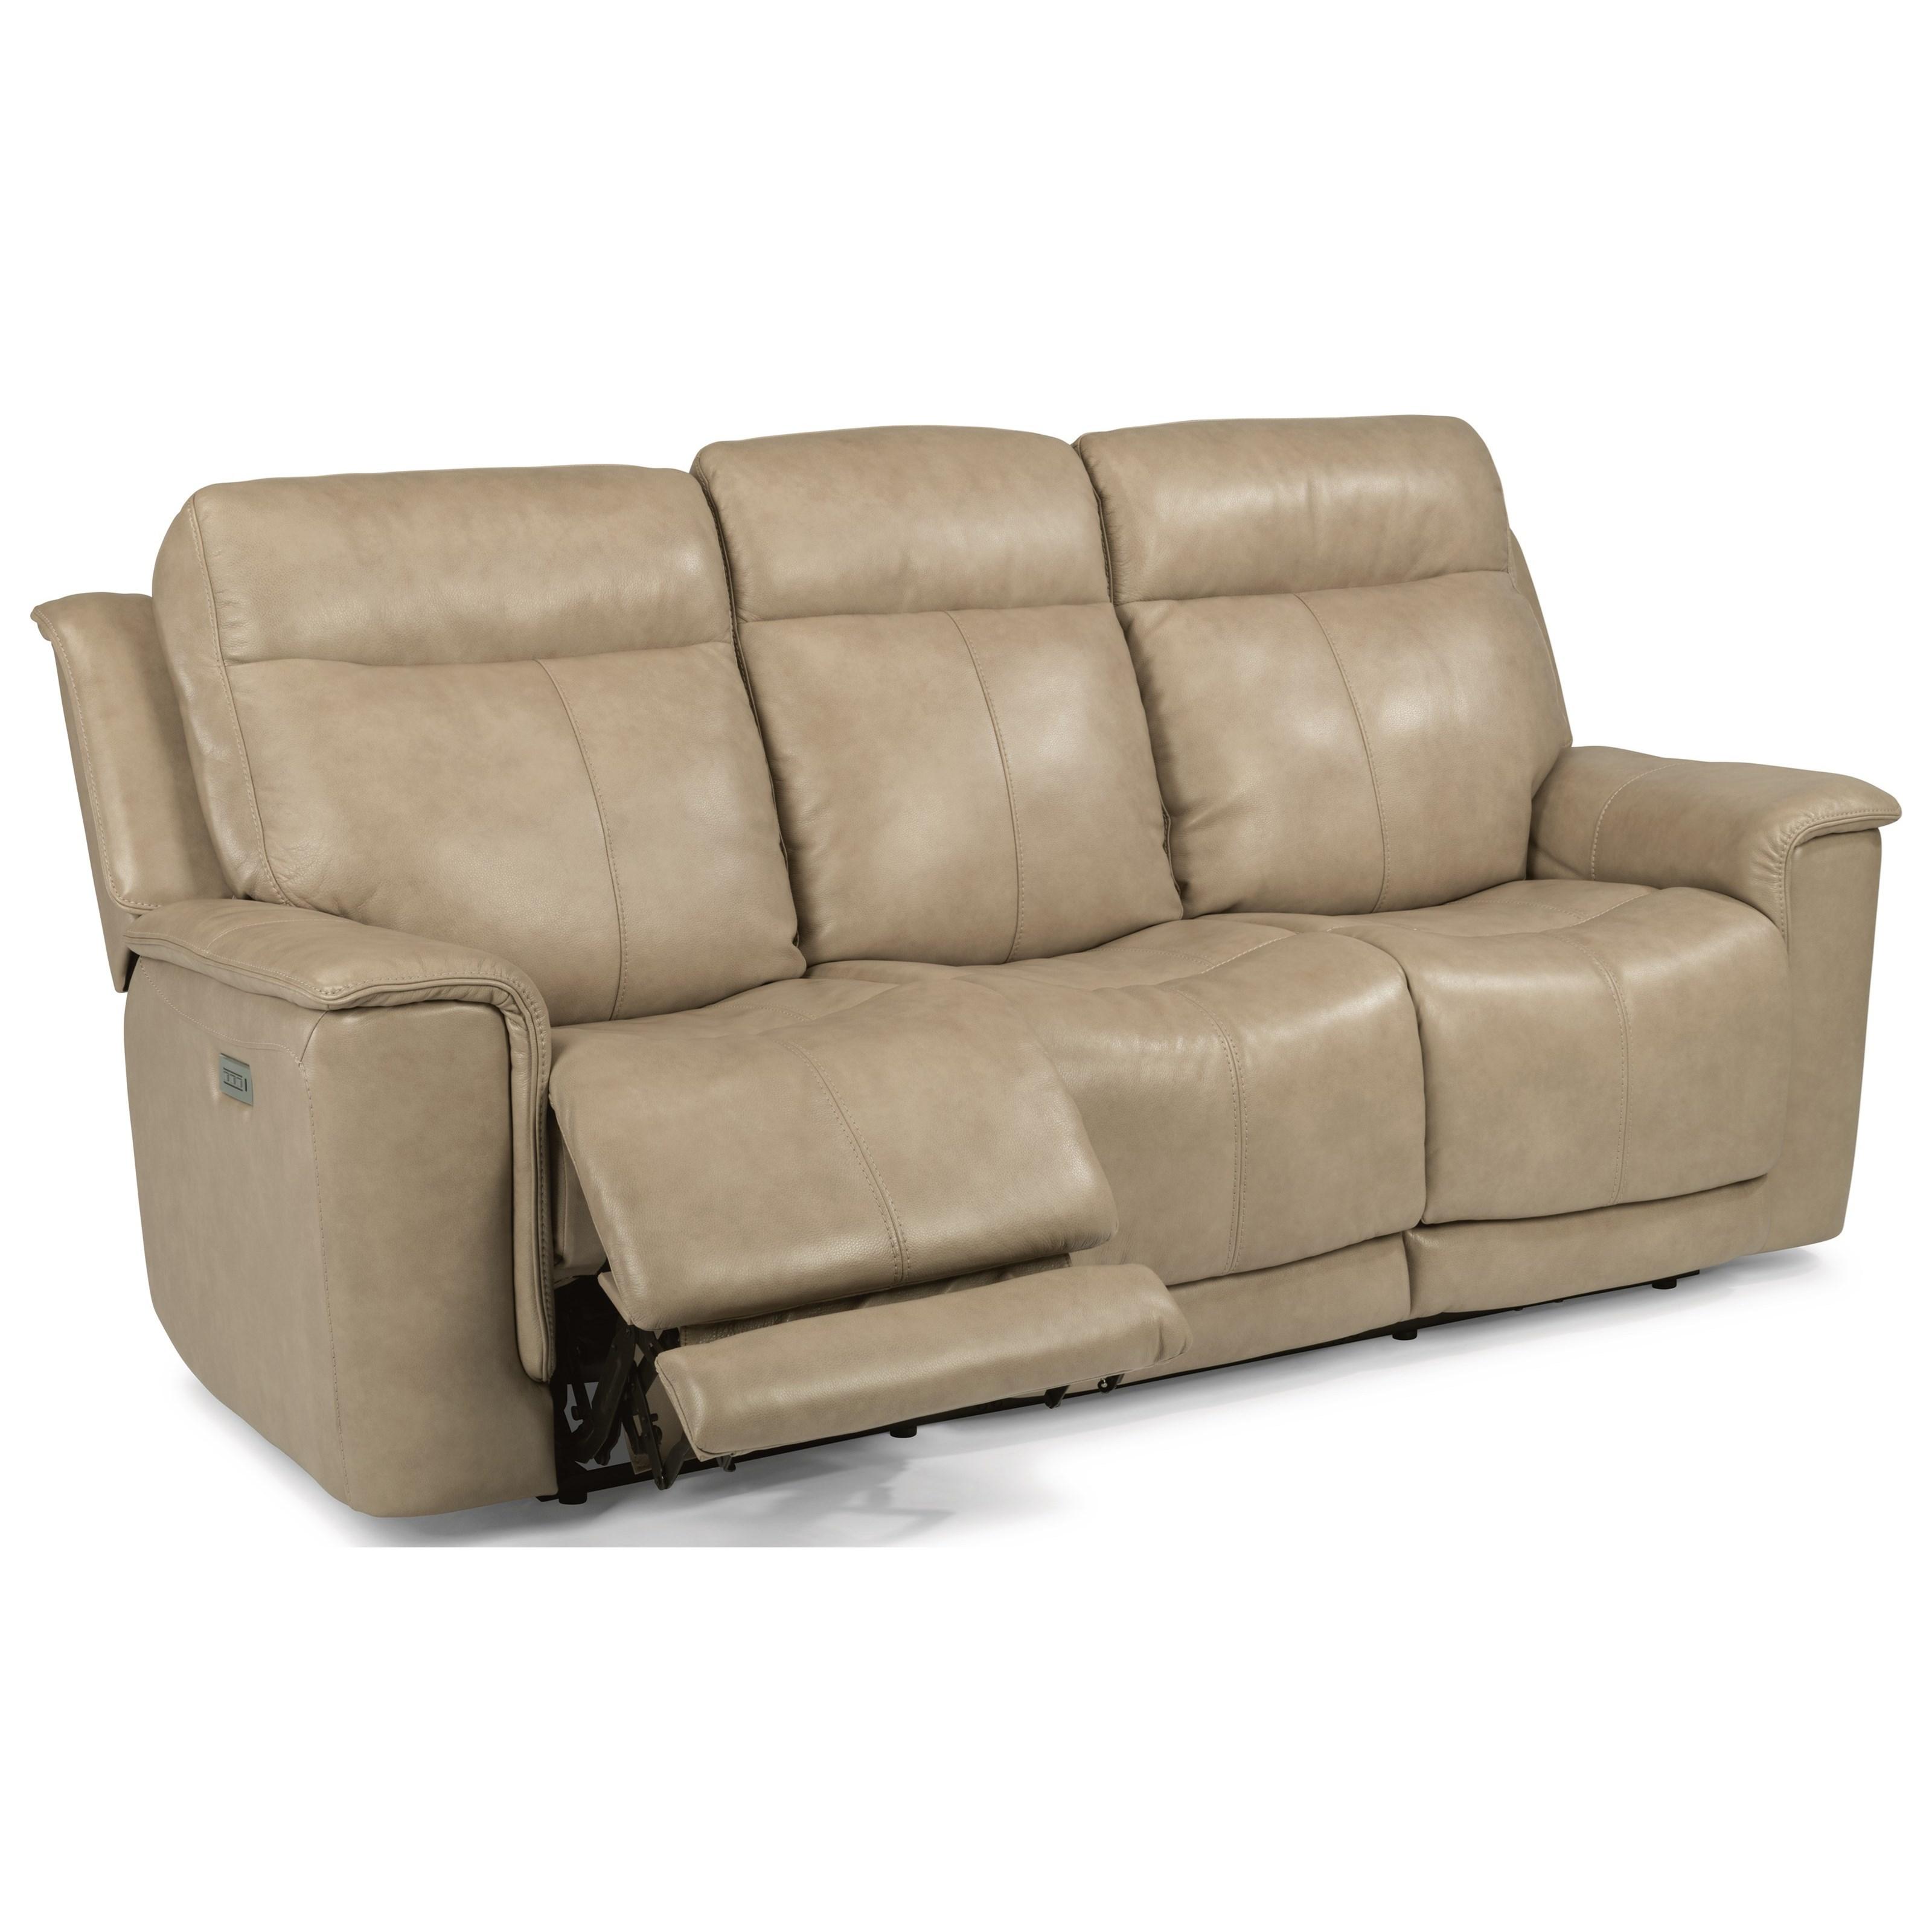 Latitudes - Miller Power Reclining Sofa by Flexsteel at Belfort Furniture